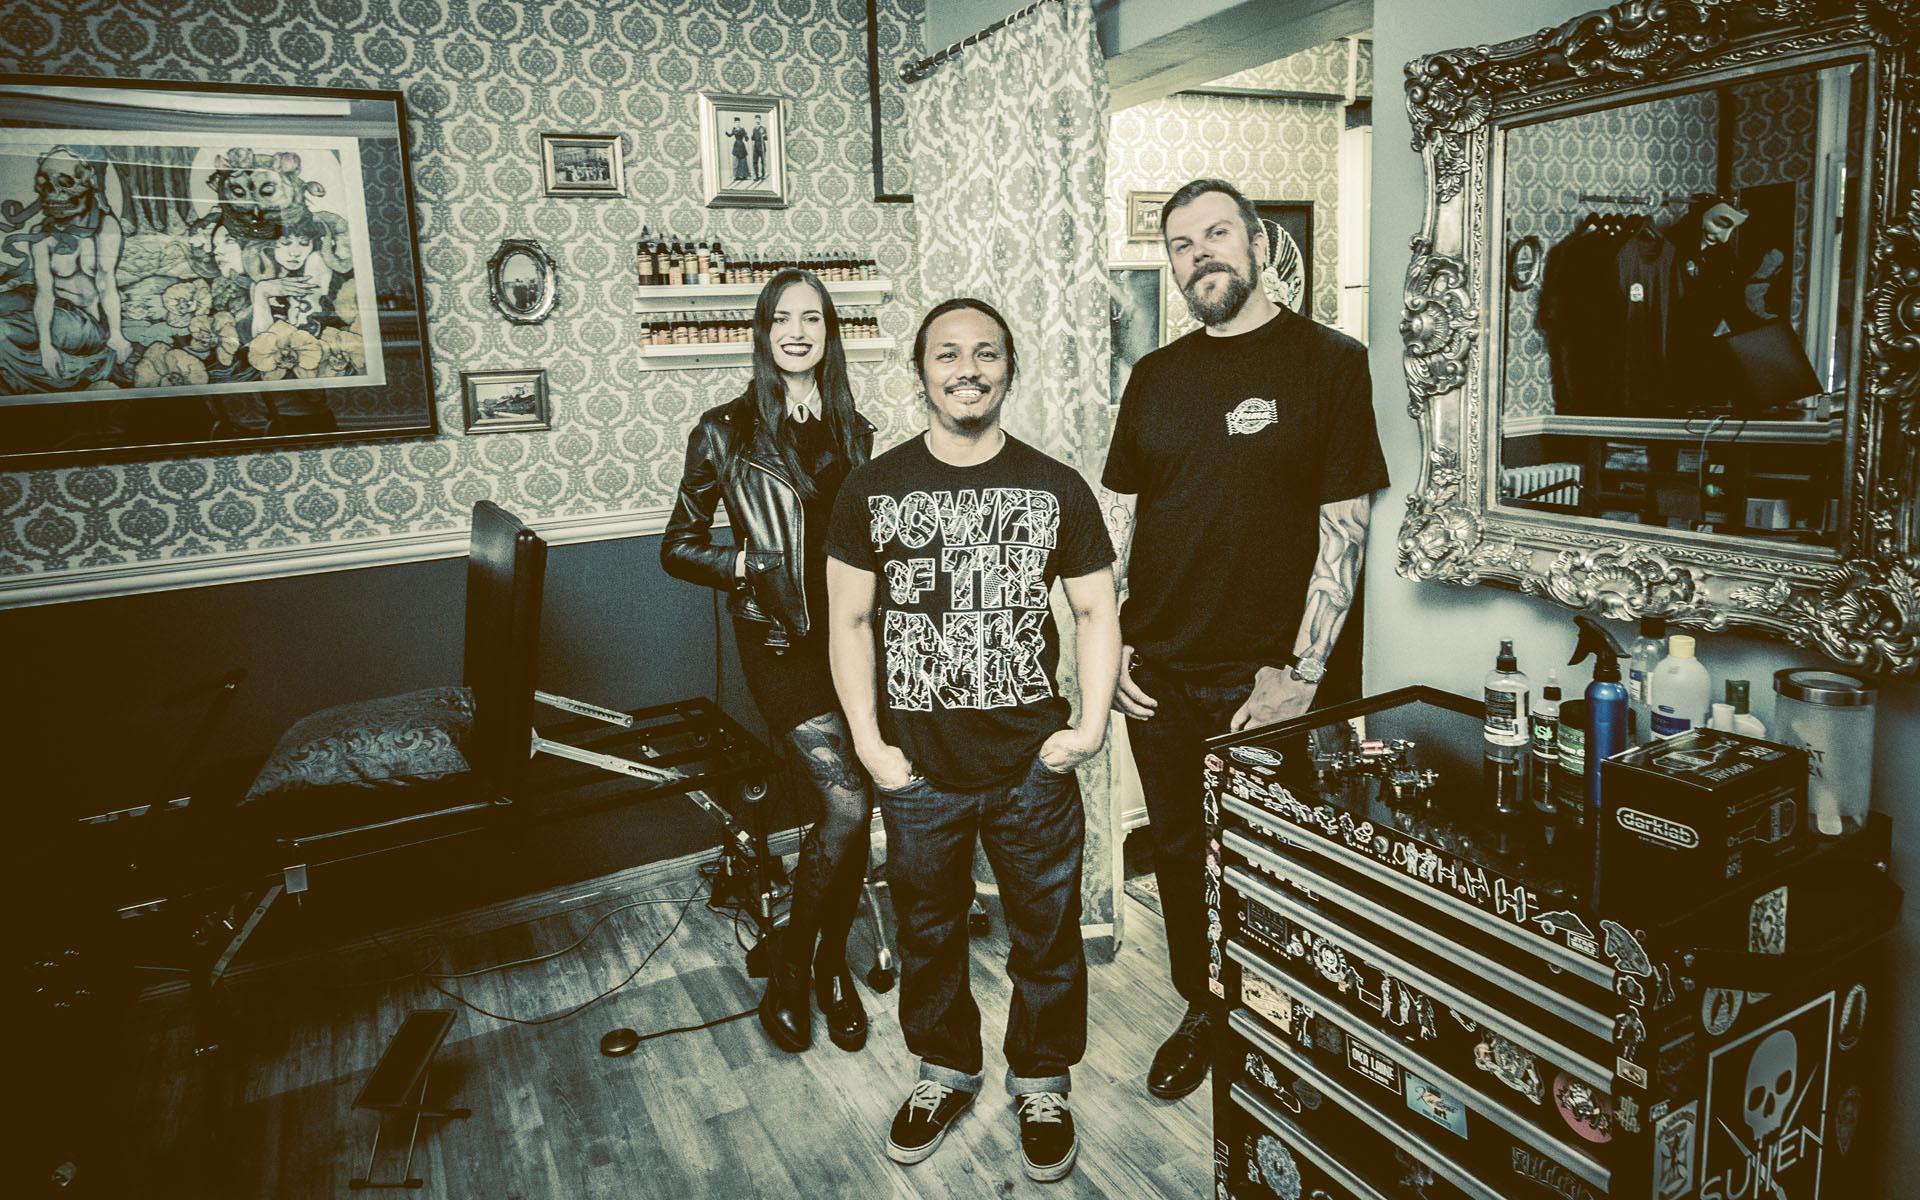 Krunikan Leima | Tatuointi & Taide | Helsinki + Walk In Tatuoinnit